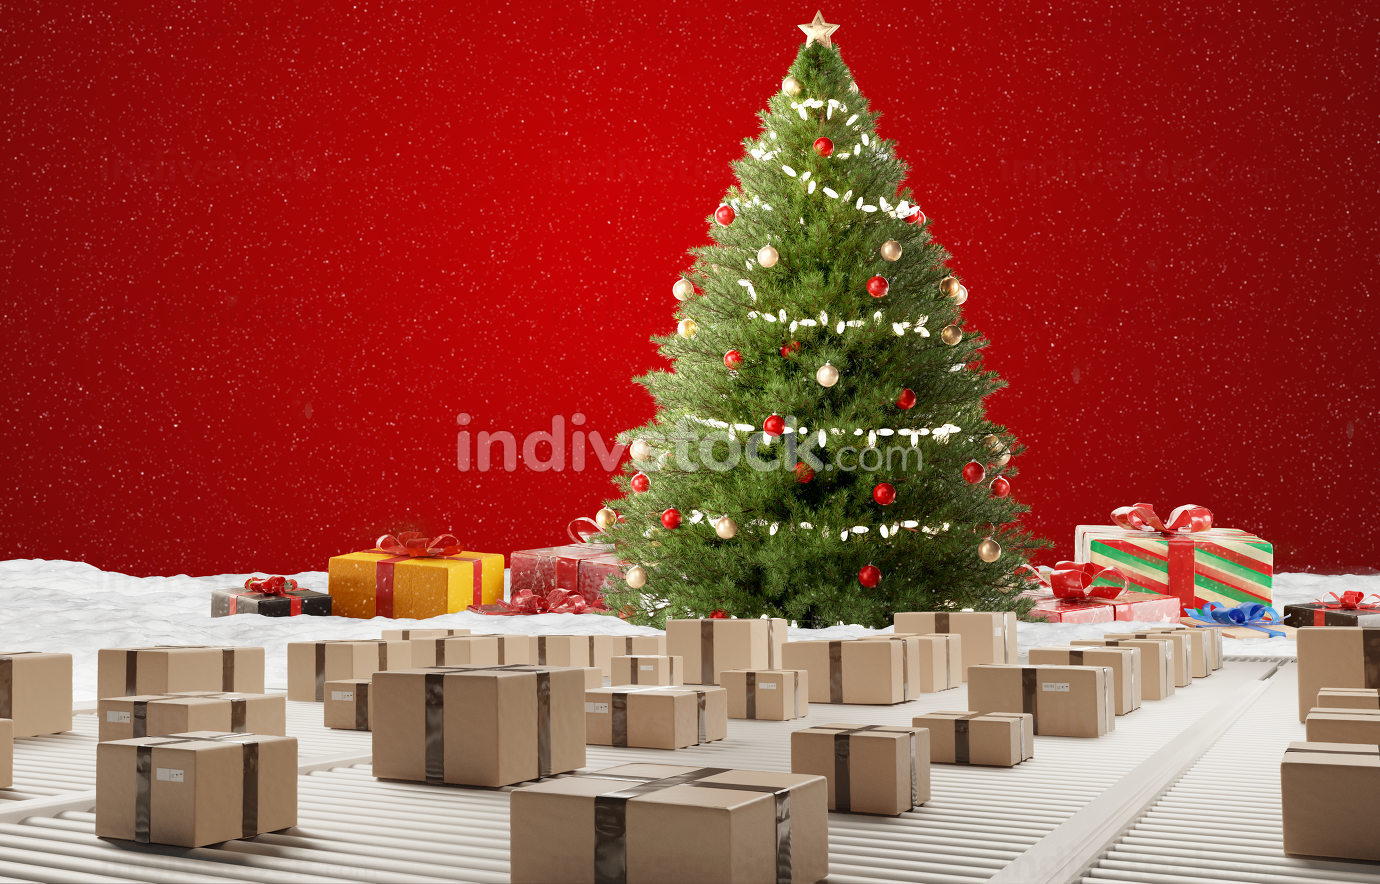 christmas tree postal parcel logistics shipping parcels 3d-illus